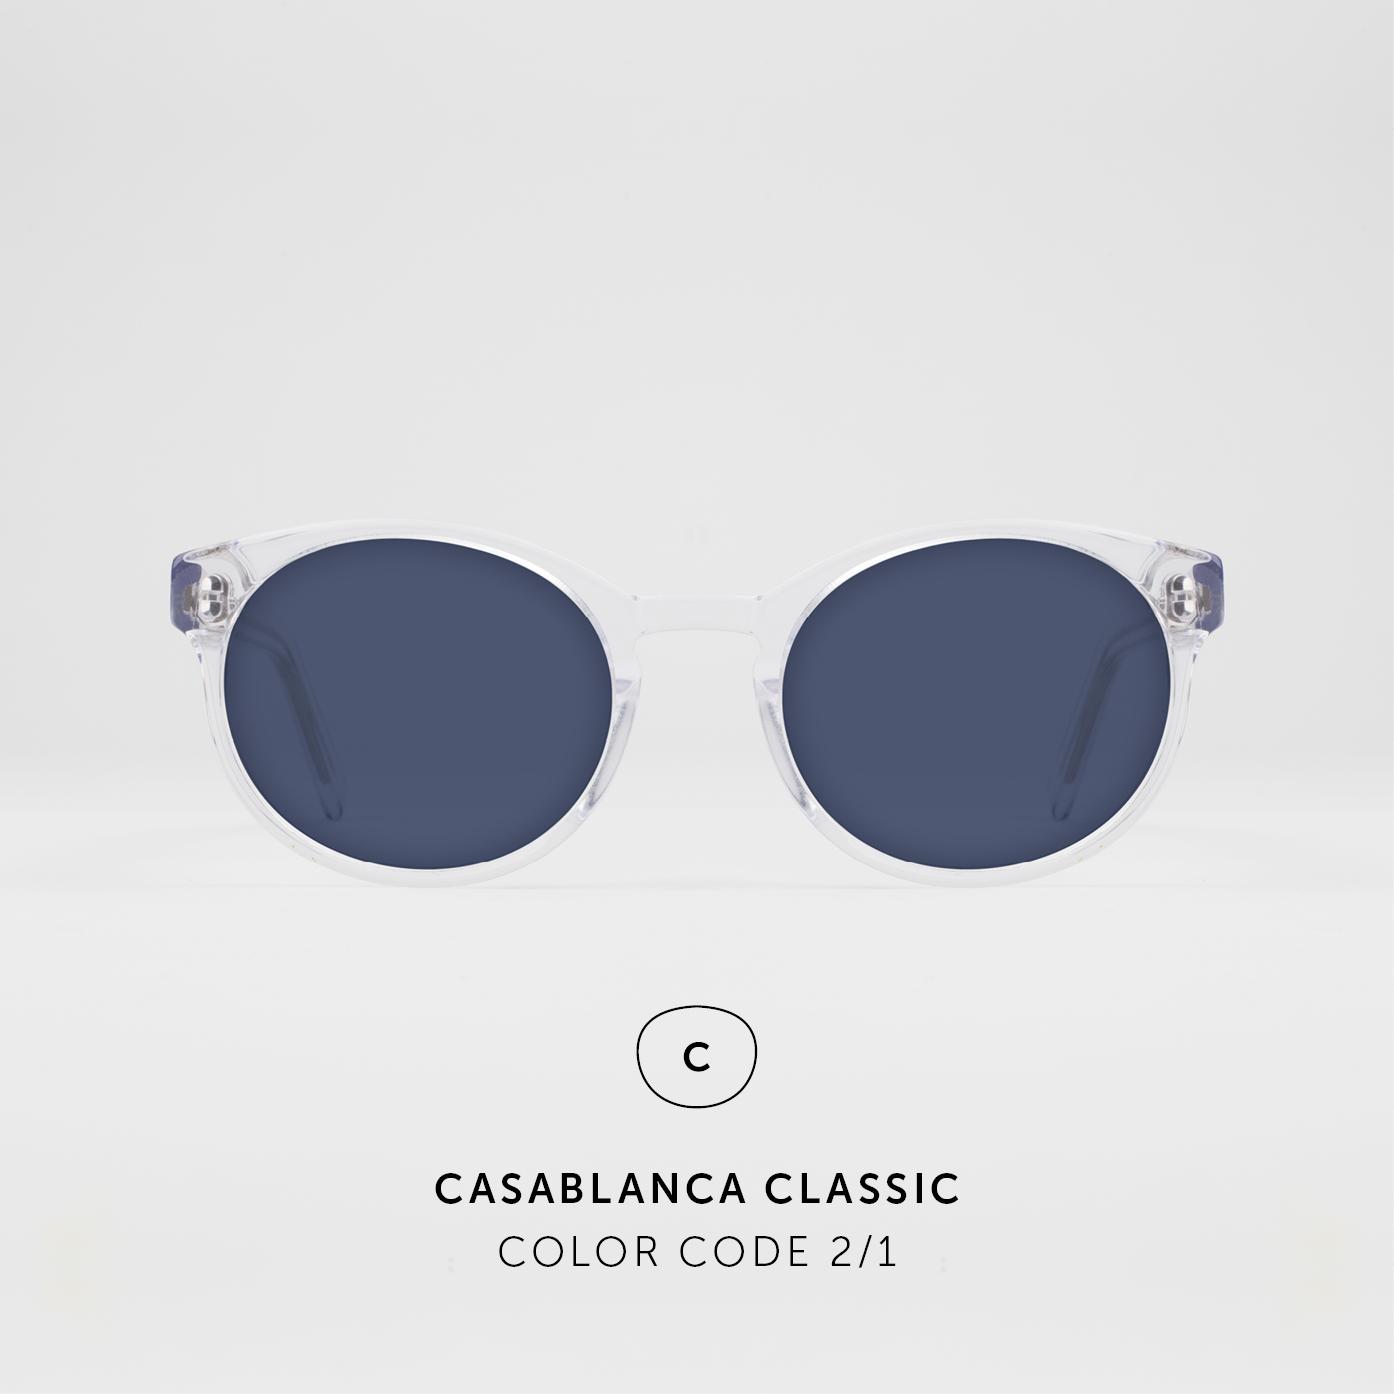 CasablancaClassic14.jpg